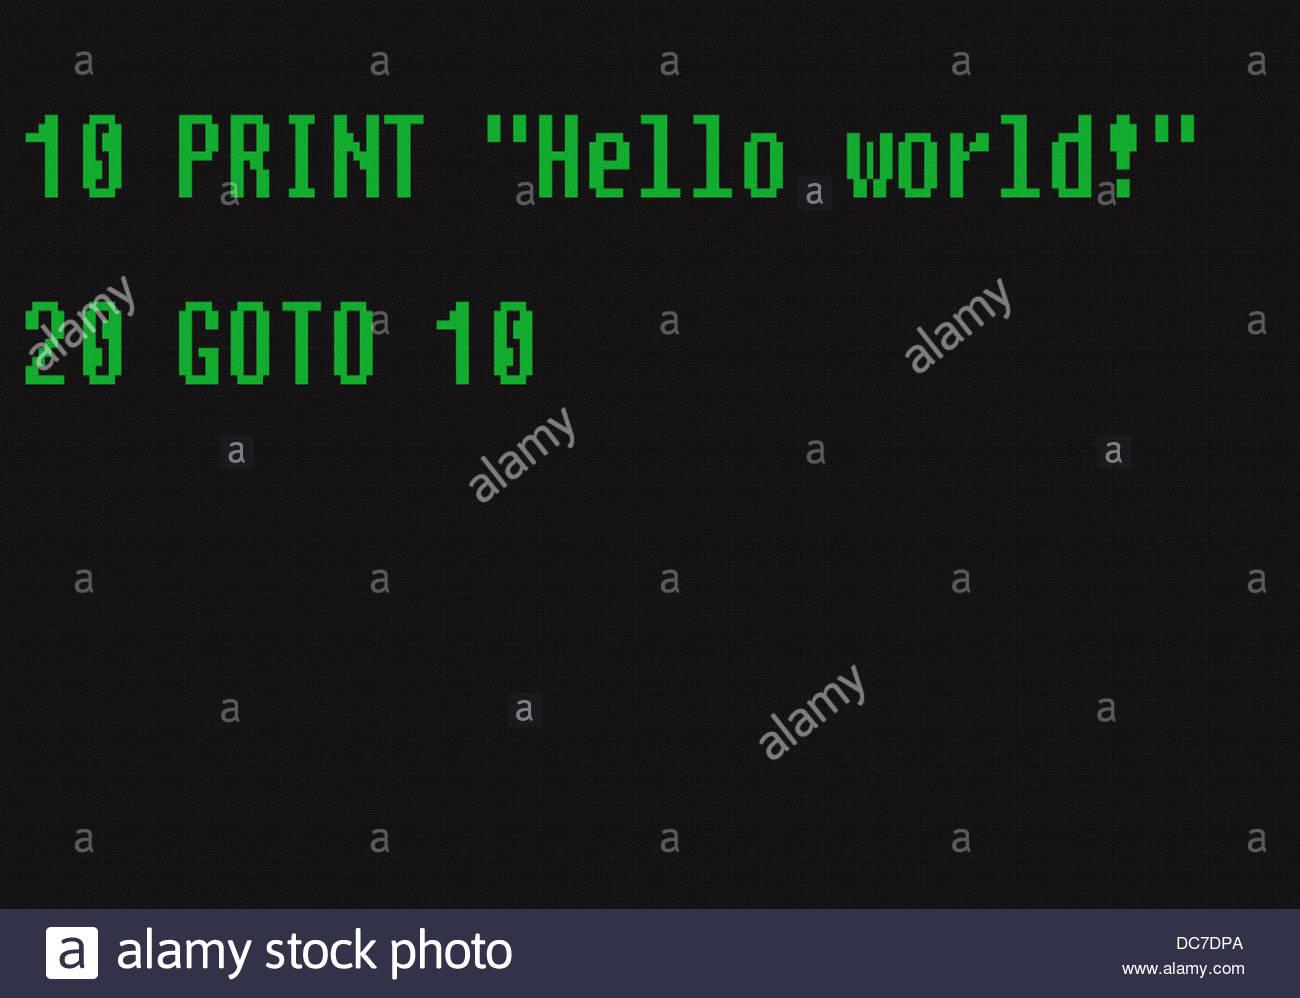 Digital composite Basic Computer Sprache 10 Print Hallo Welt, 20 Goto 10 Stockbild